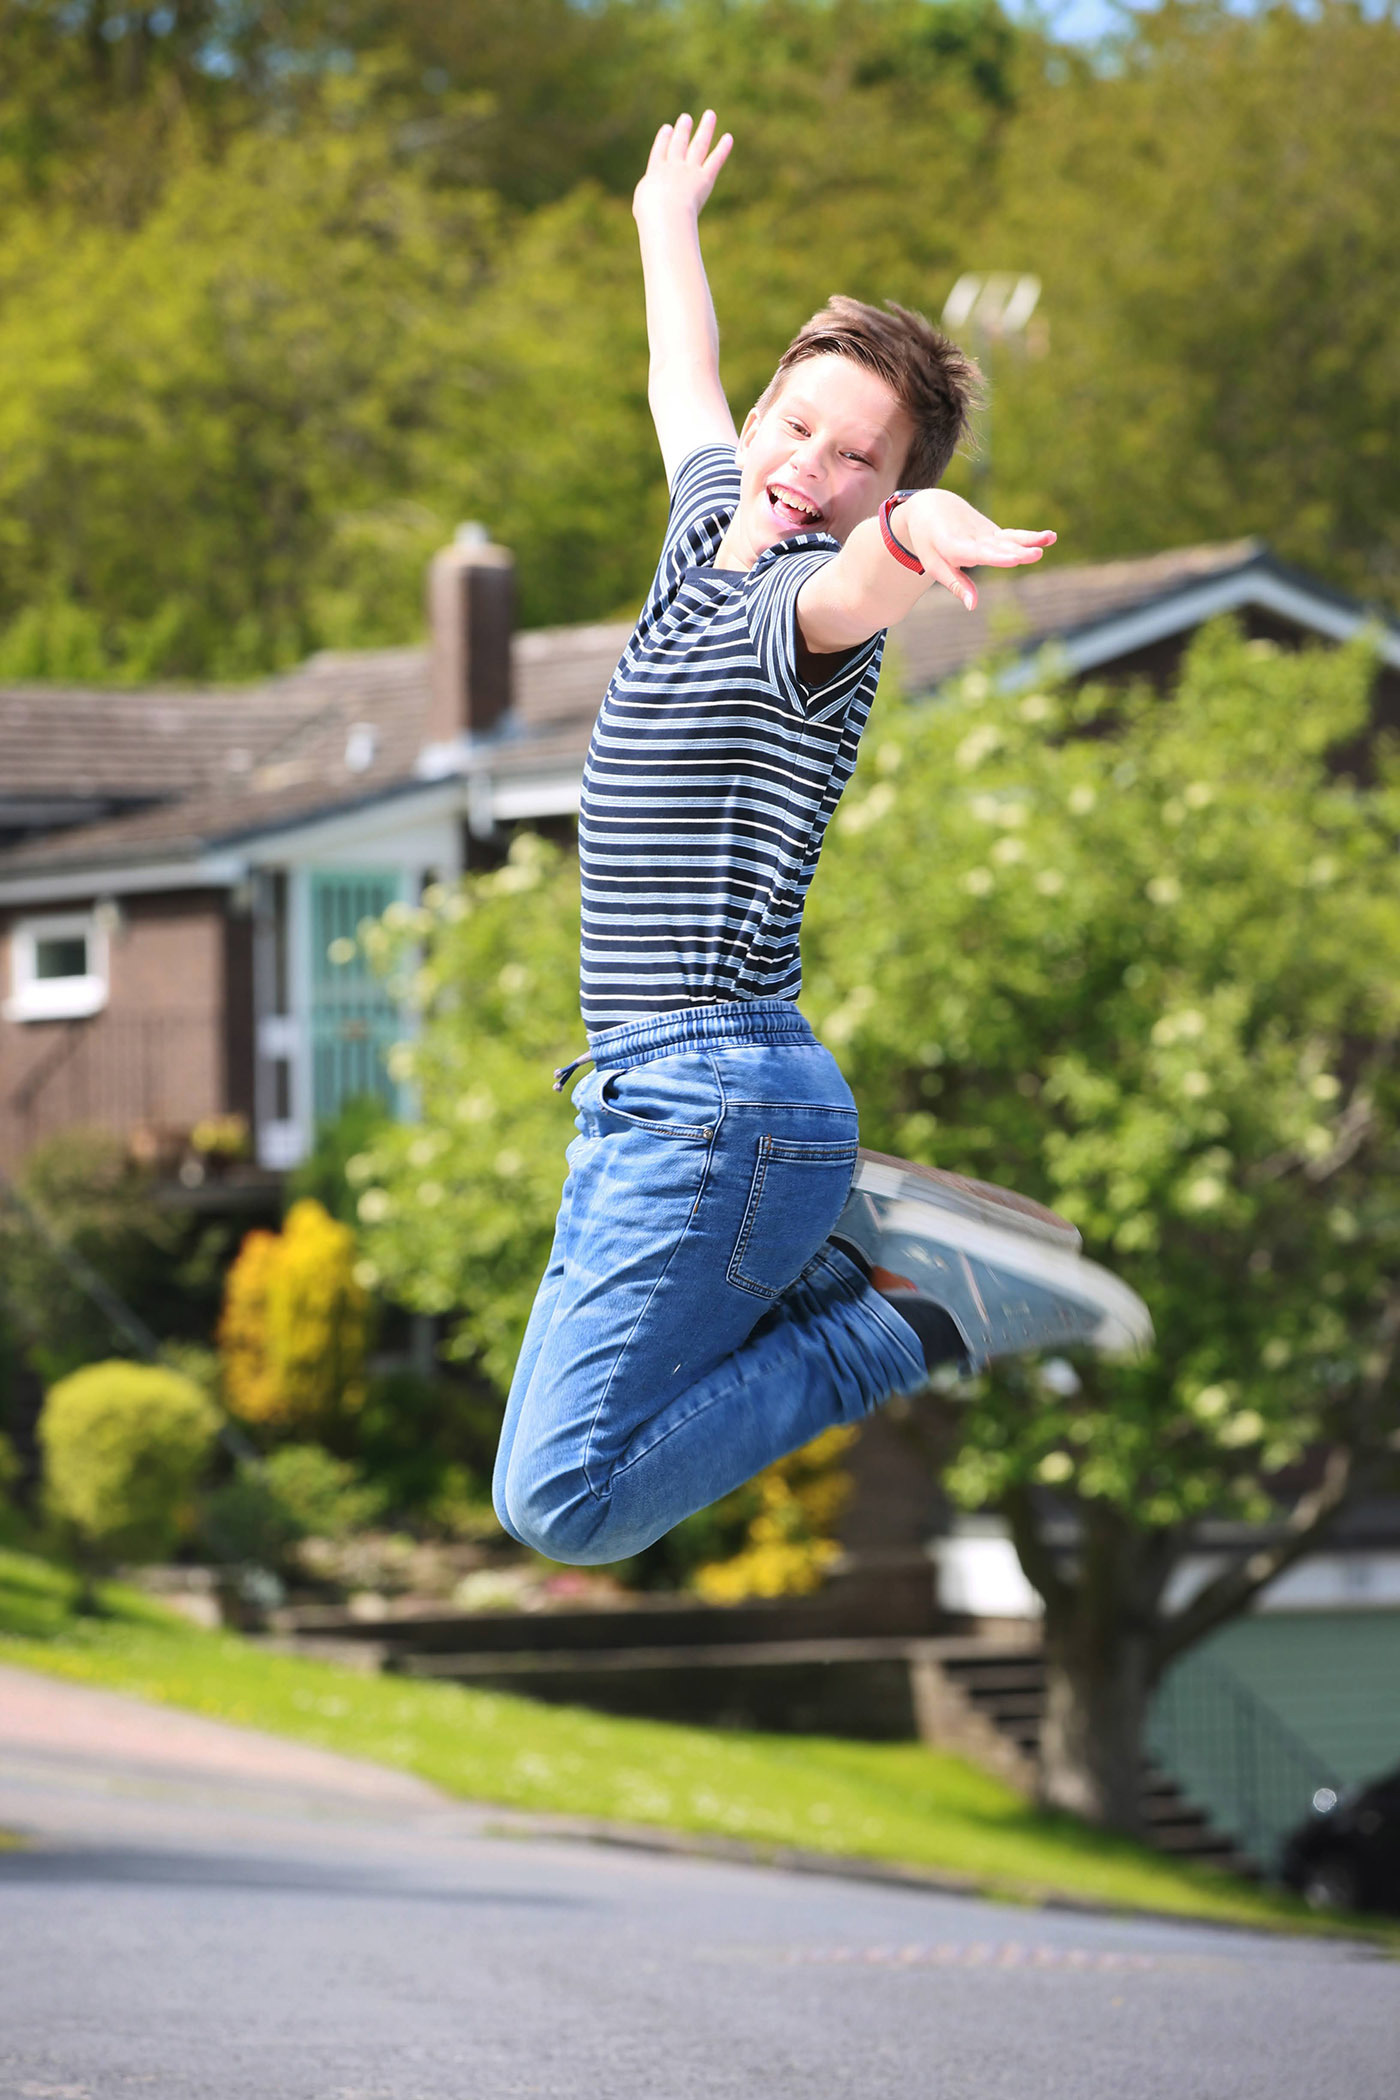 Adam Sangster 13 of Durham who stars in Henrietta Photo: SARAH CALDECOTT